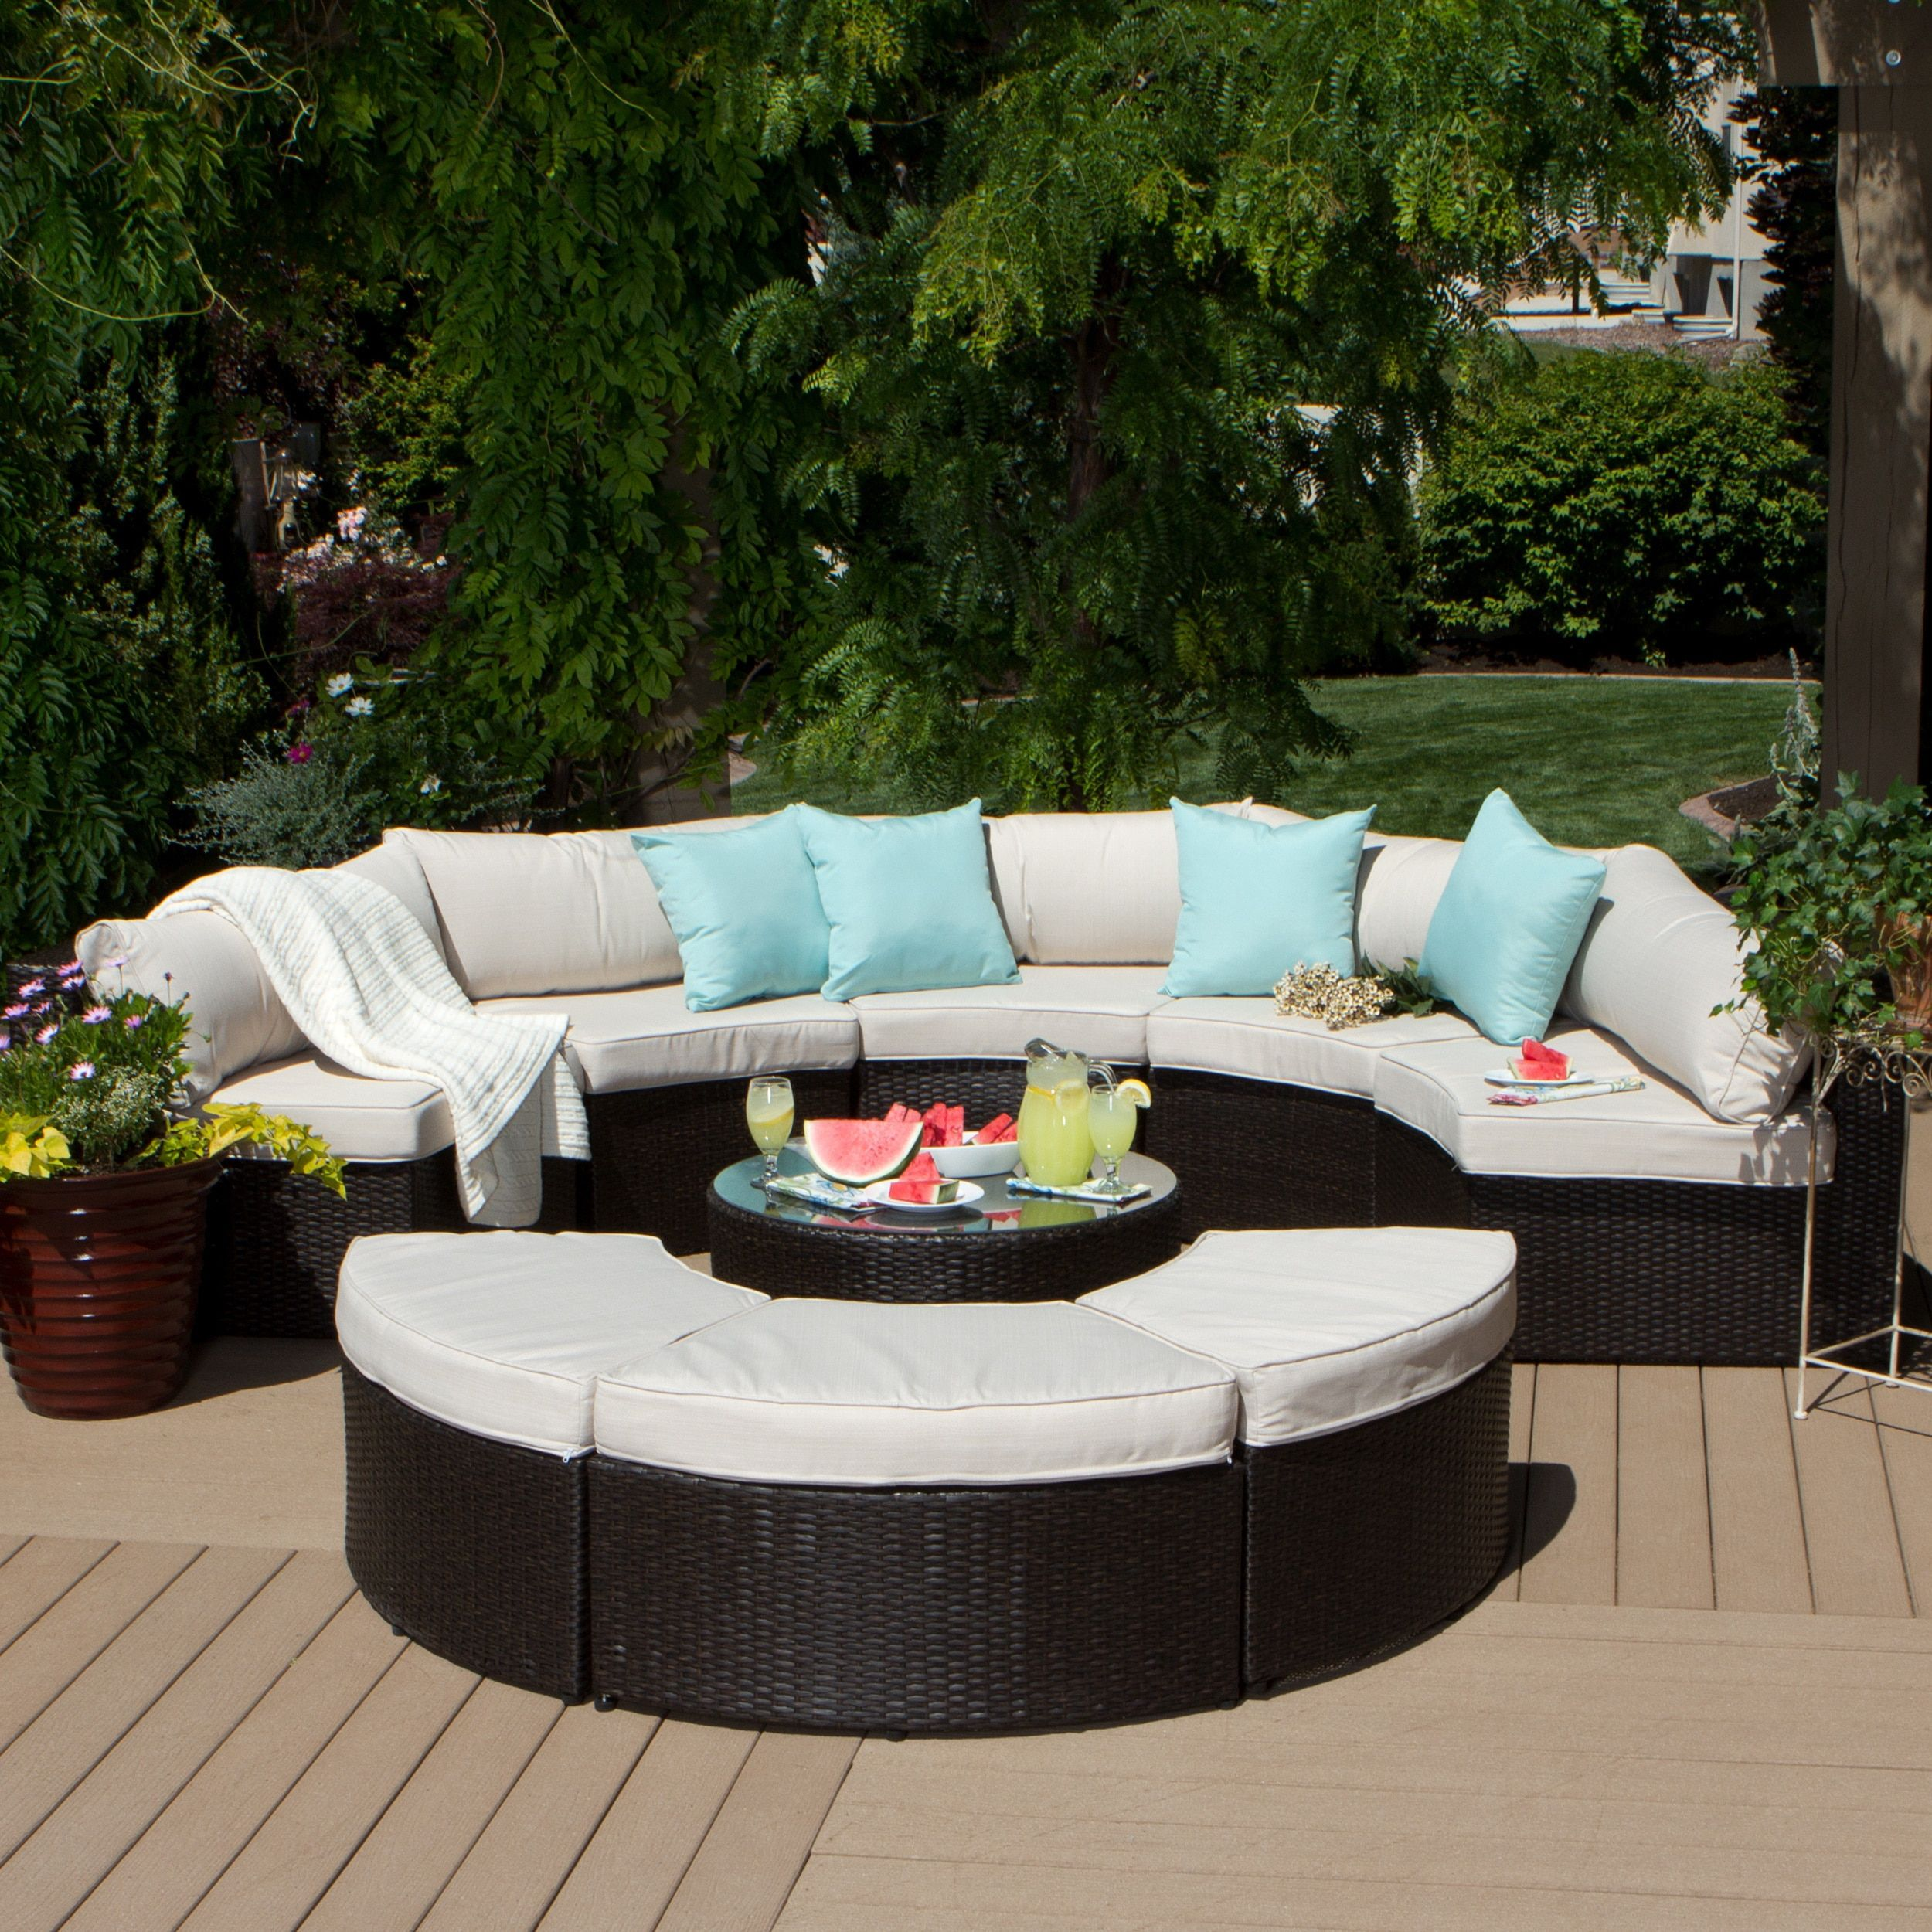 Isla 9 Piece Outdoor Sectional Beige Size Sets Patio Furniture Aluminum